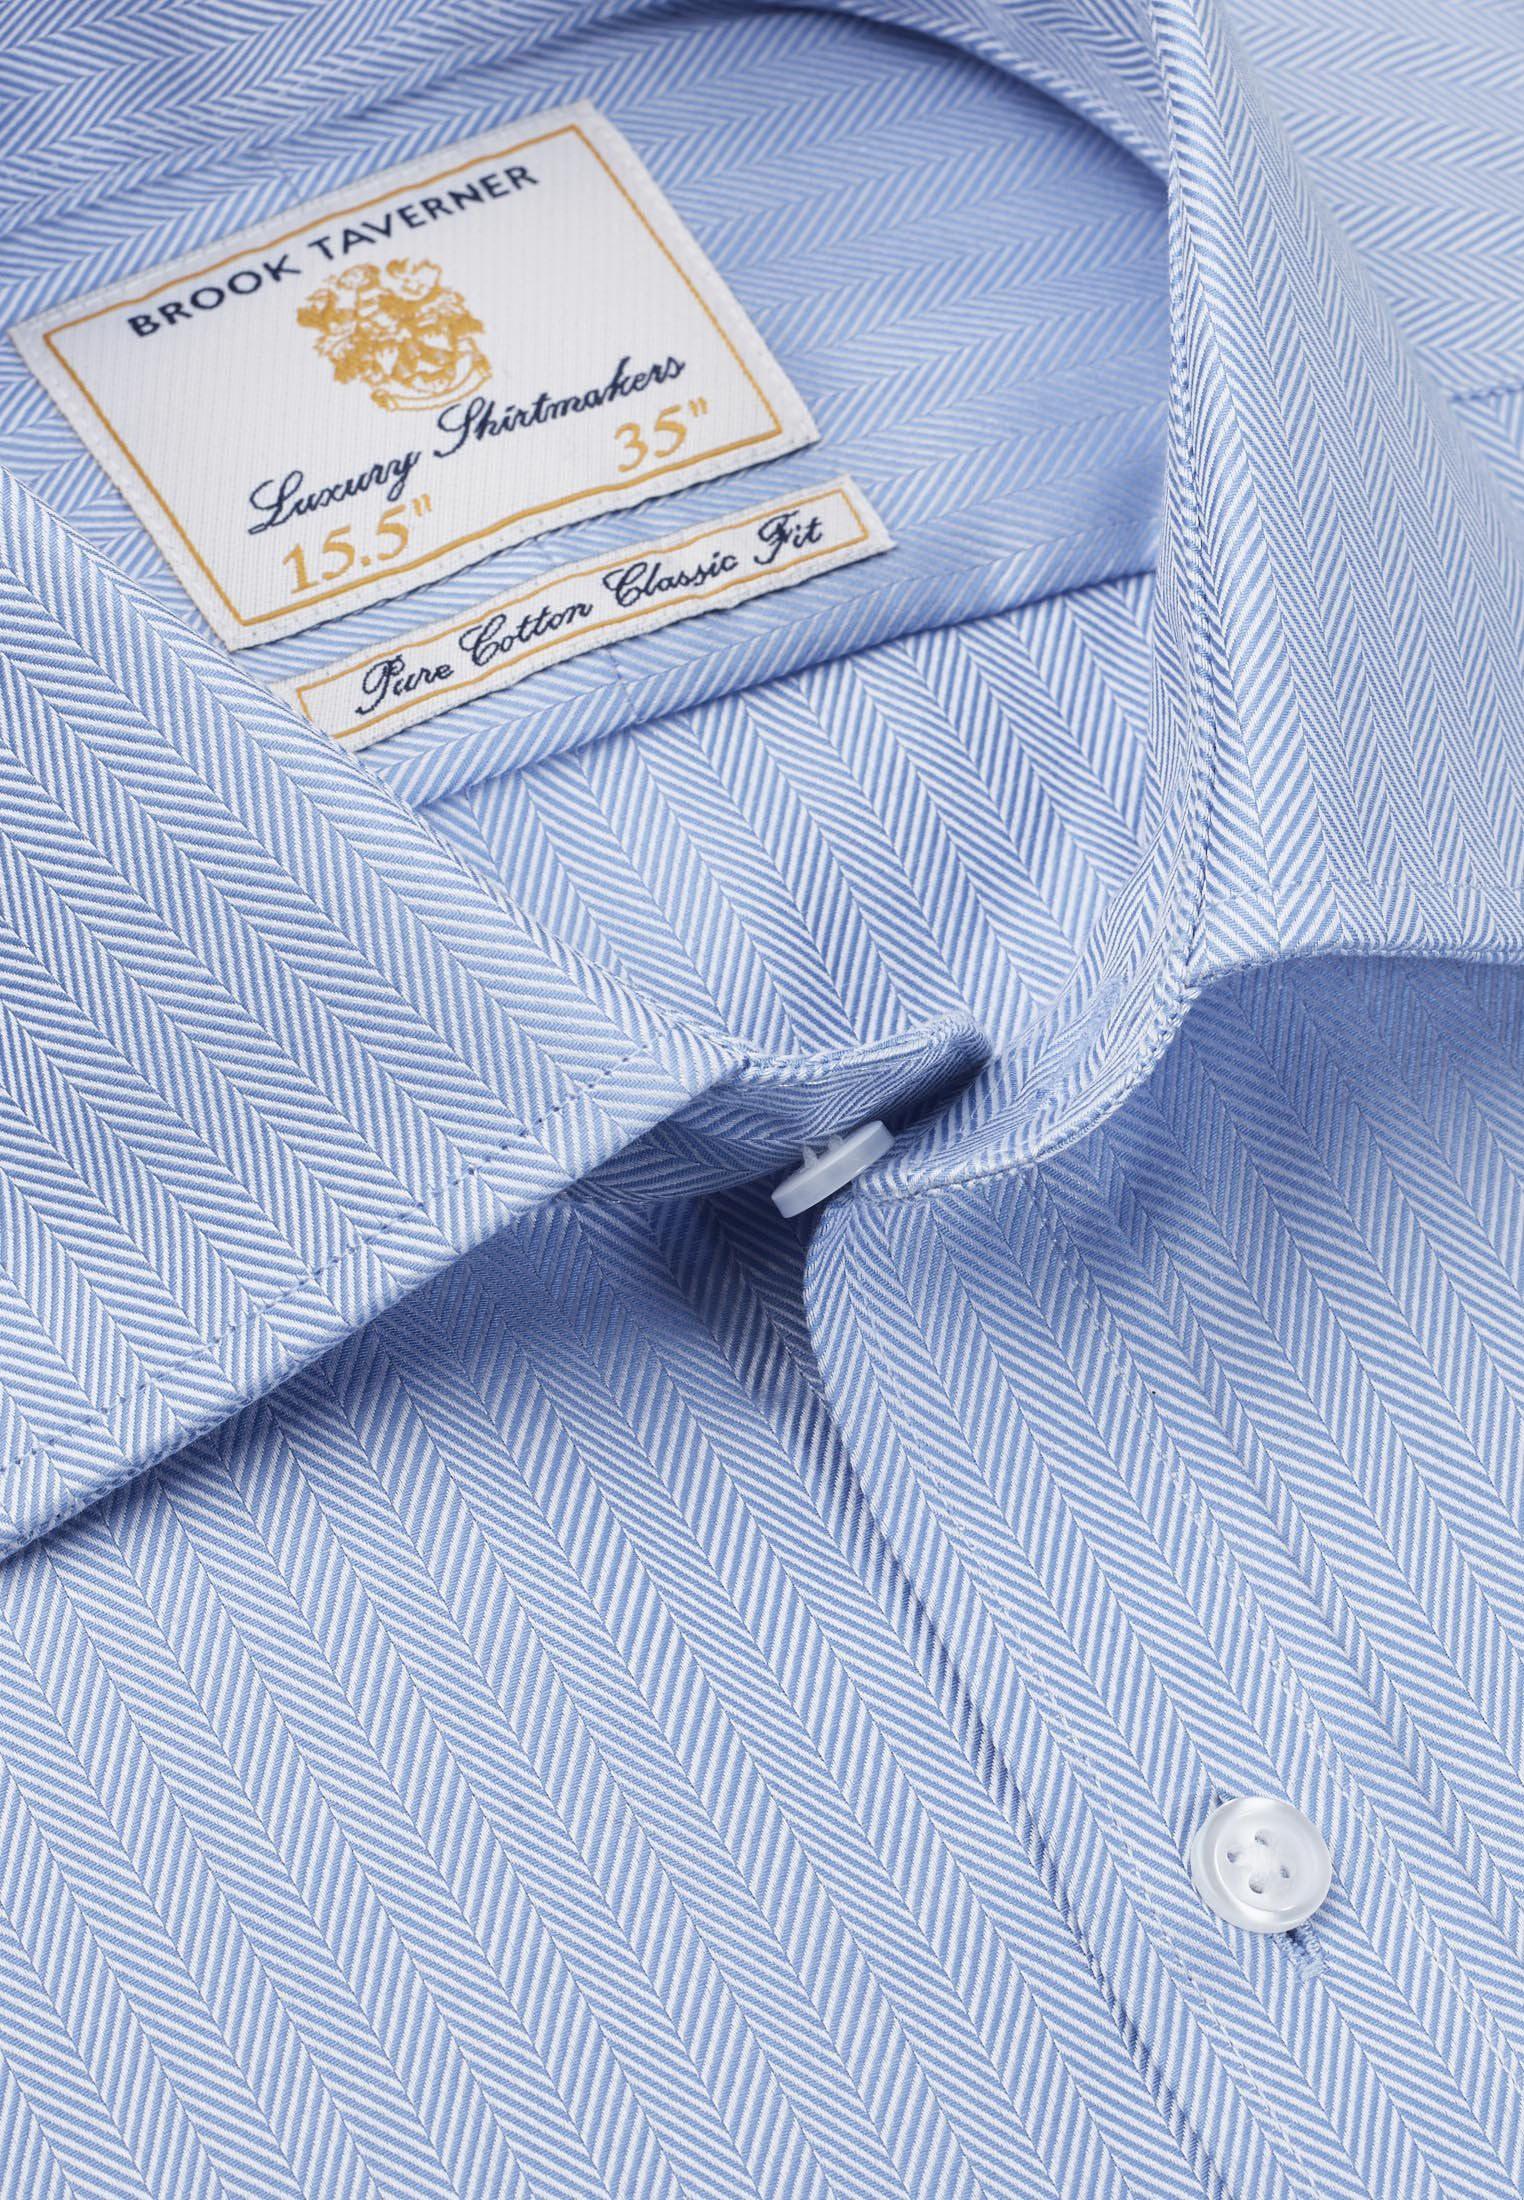 Single and Double Cuff Blue Herringbone 100% Easycare Cotton Shirt